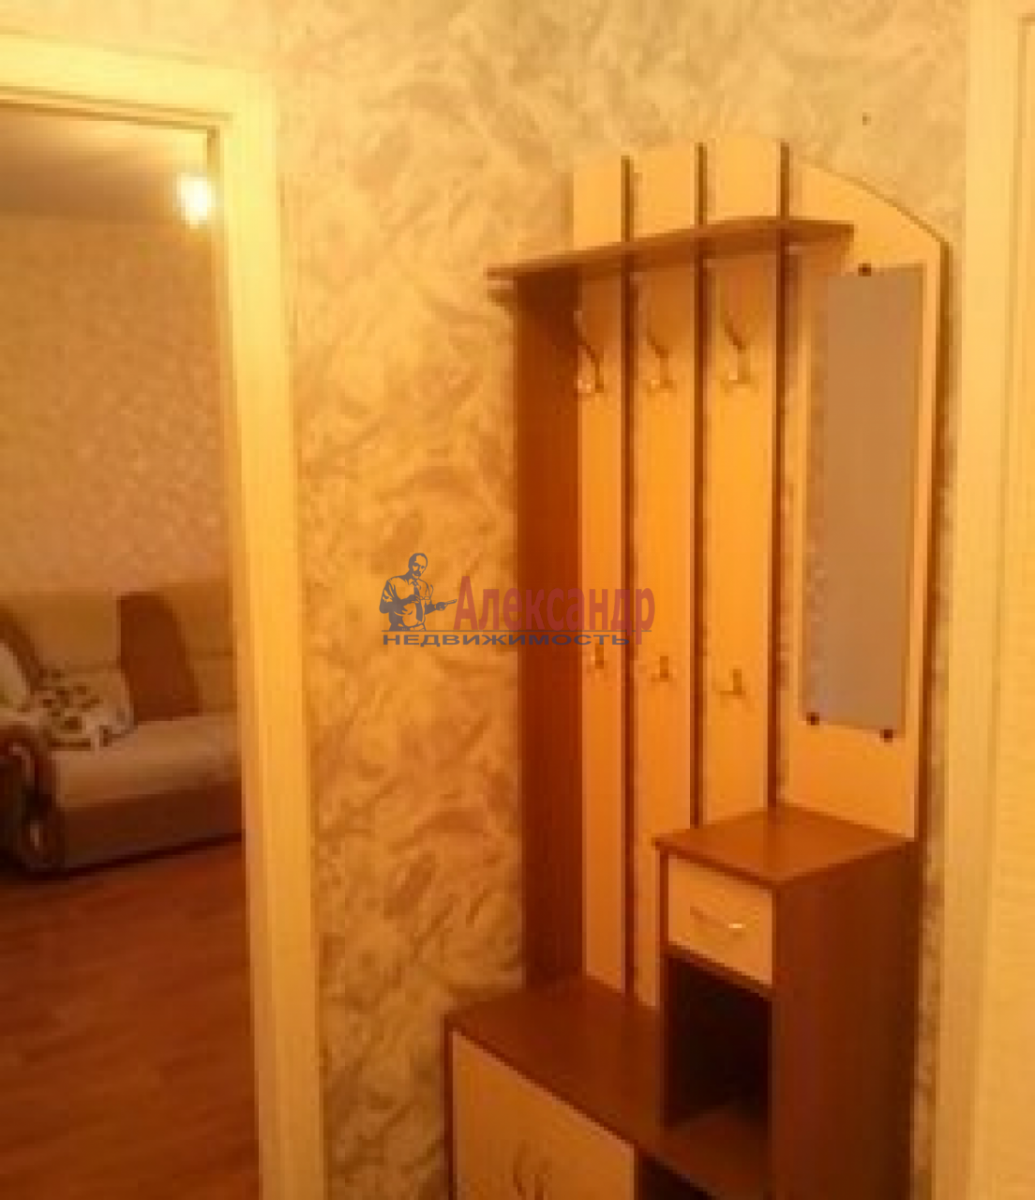 1-комнатная квартира (39м2) в аренду по адресу Ленинский пр., 75— фото 2 из 6